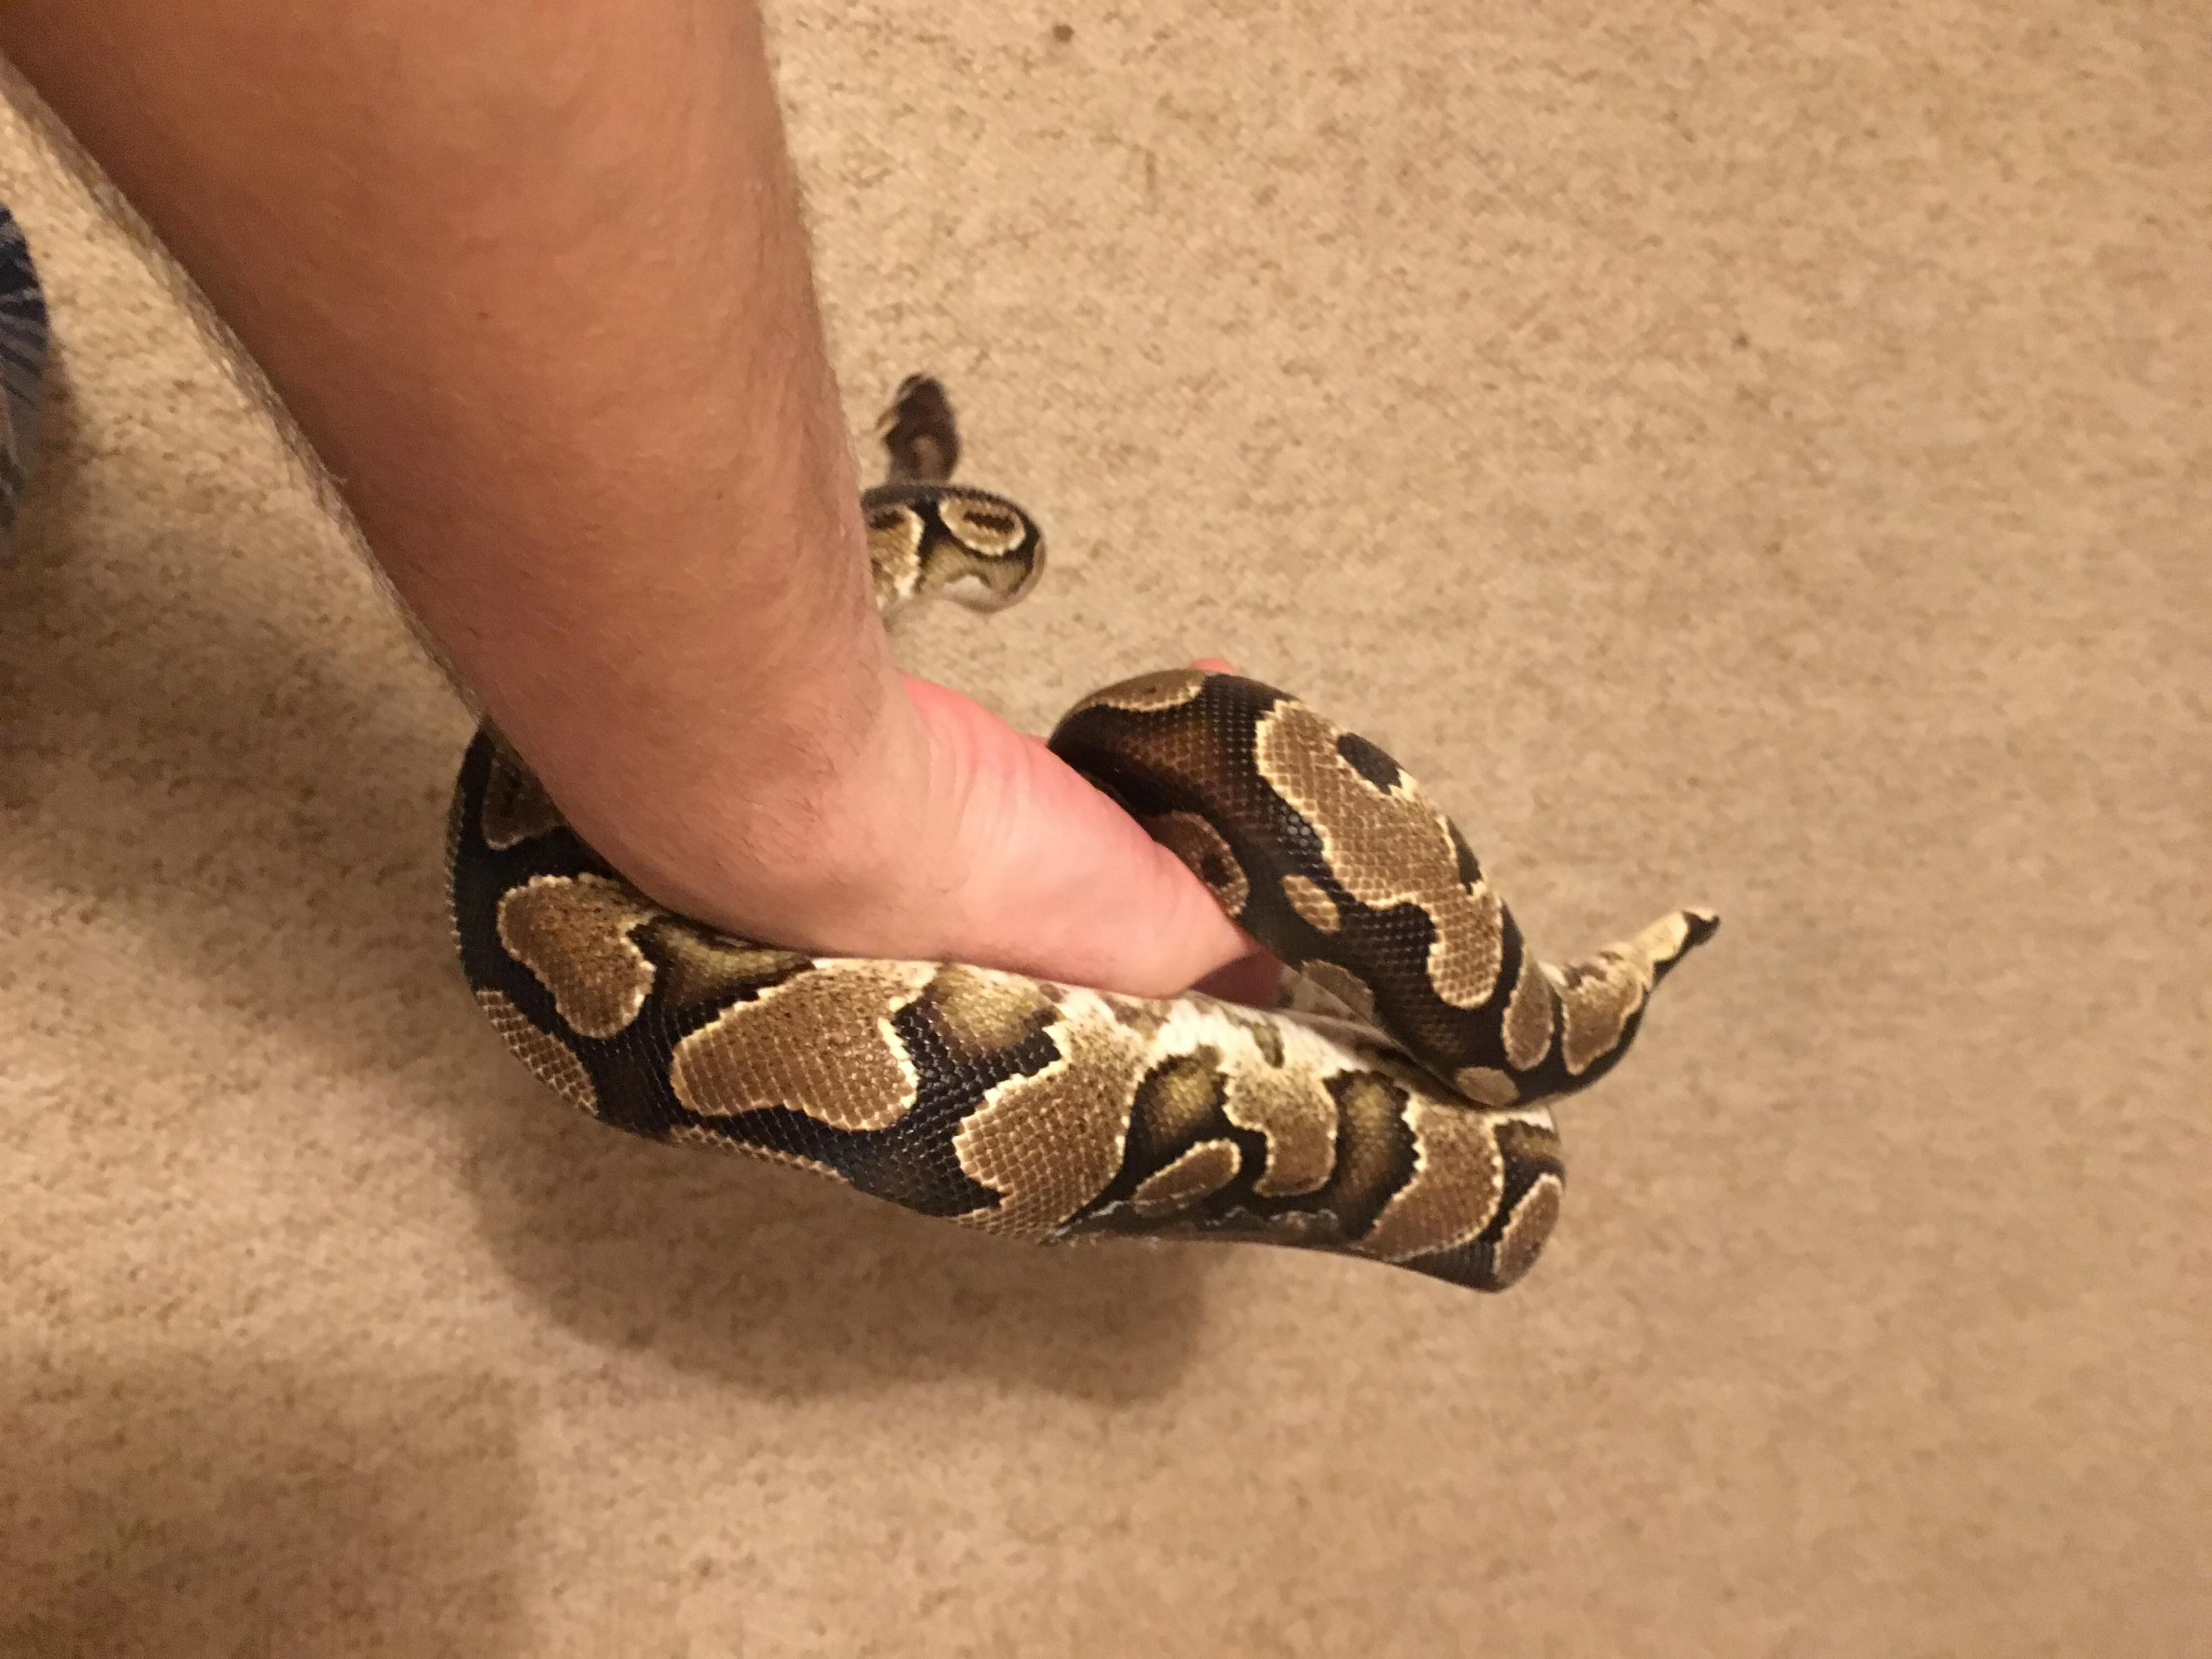 Adult Royal Pythons & Other Snakes for Sale-image_1545516410947.jpg